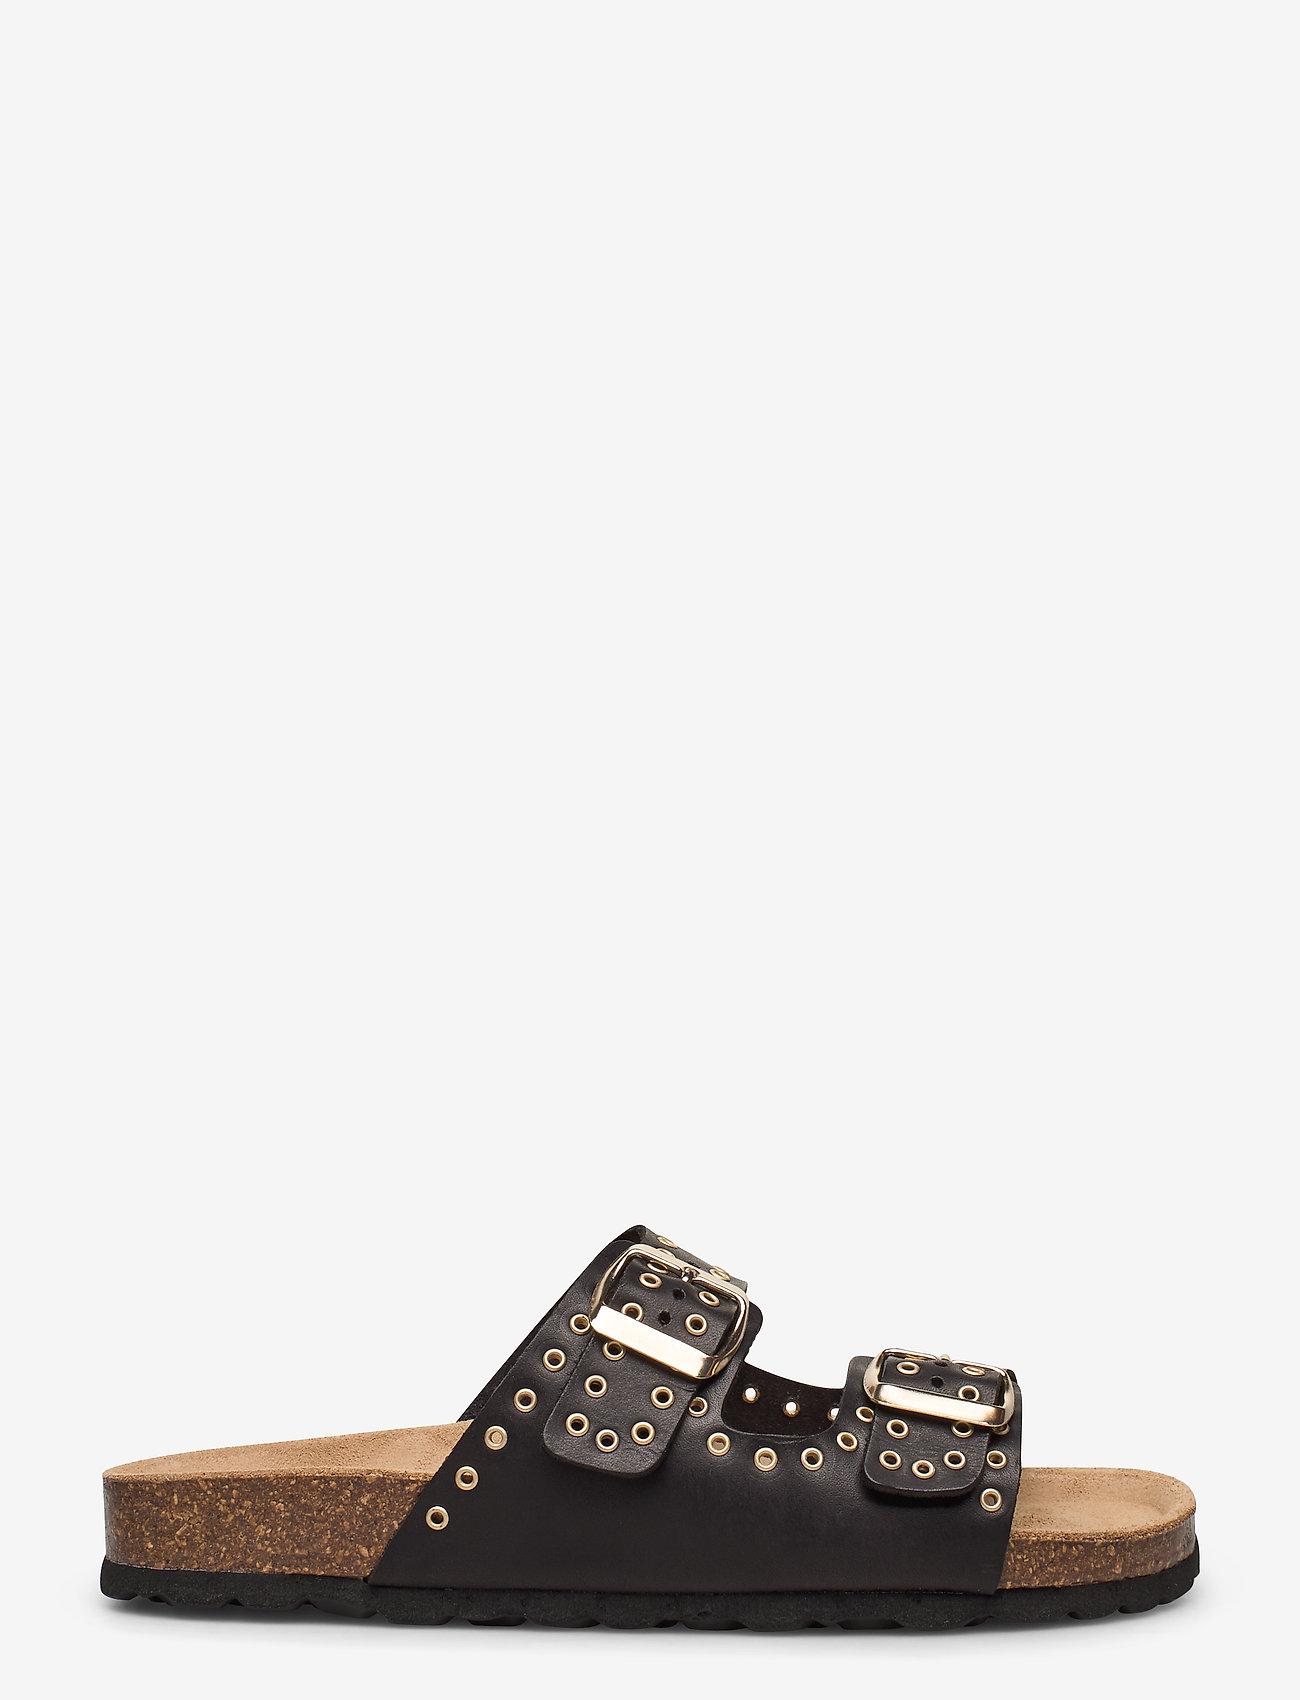 Sofie Schnoor - Sandal - płaskie sandały - black - 1